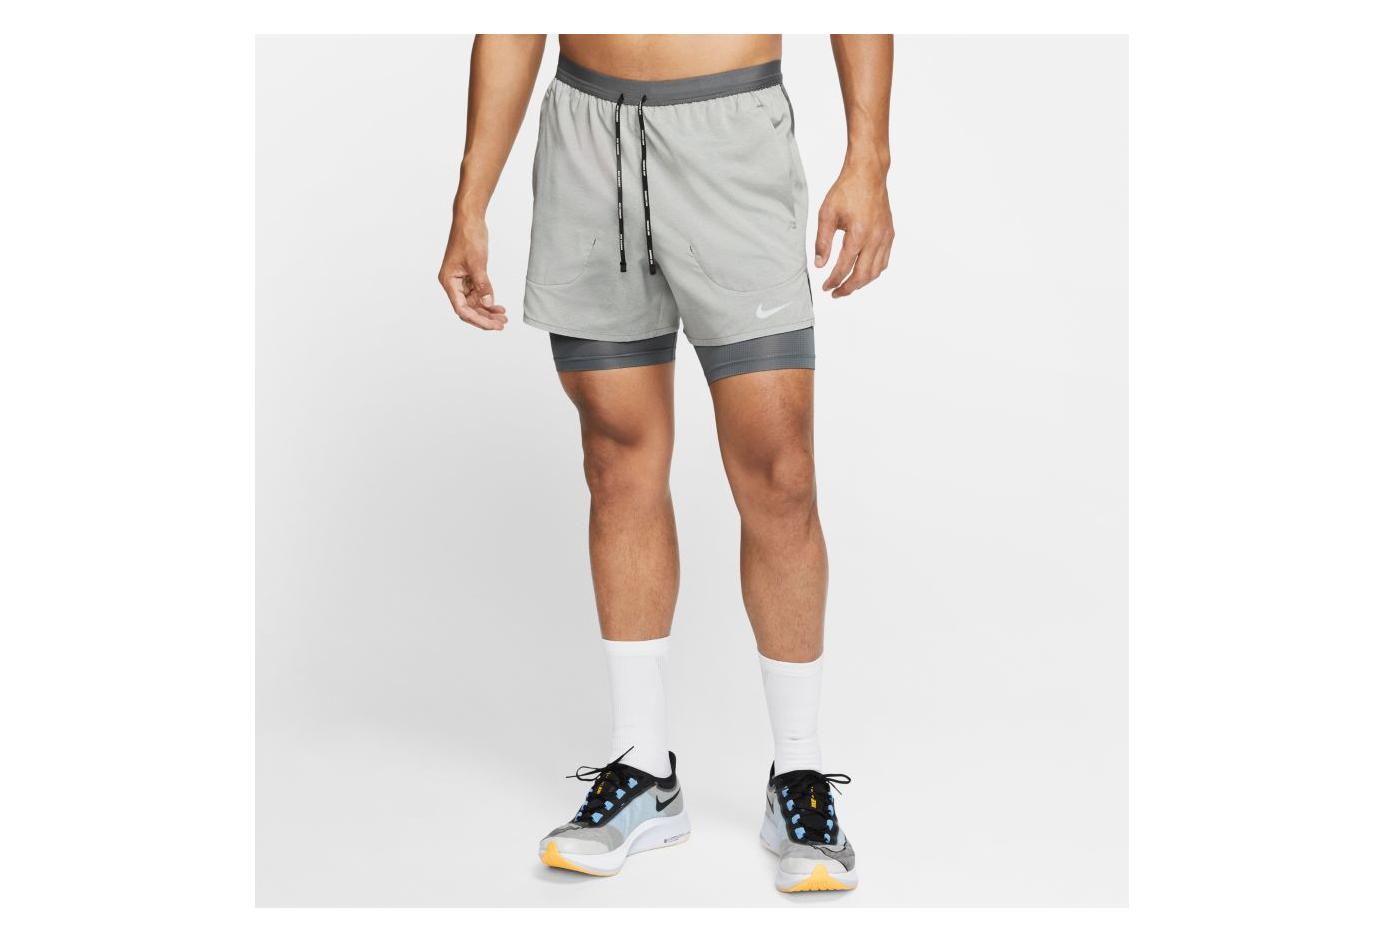 Nike Flex Stride 5 '' 2 in 1 Shorts Gray Mens